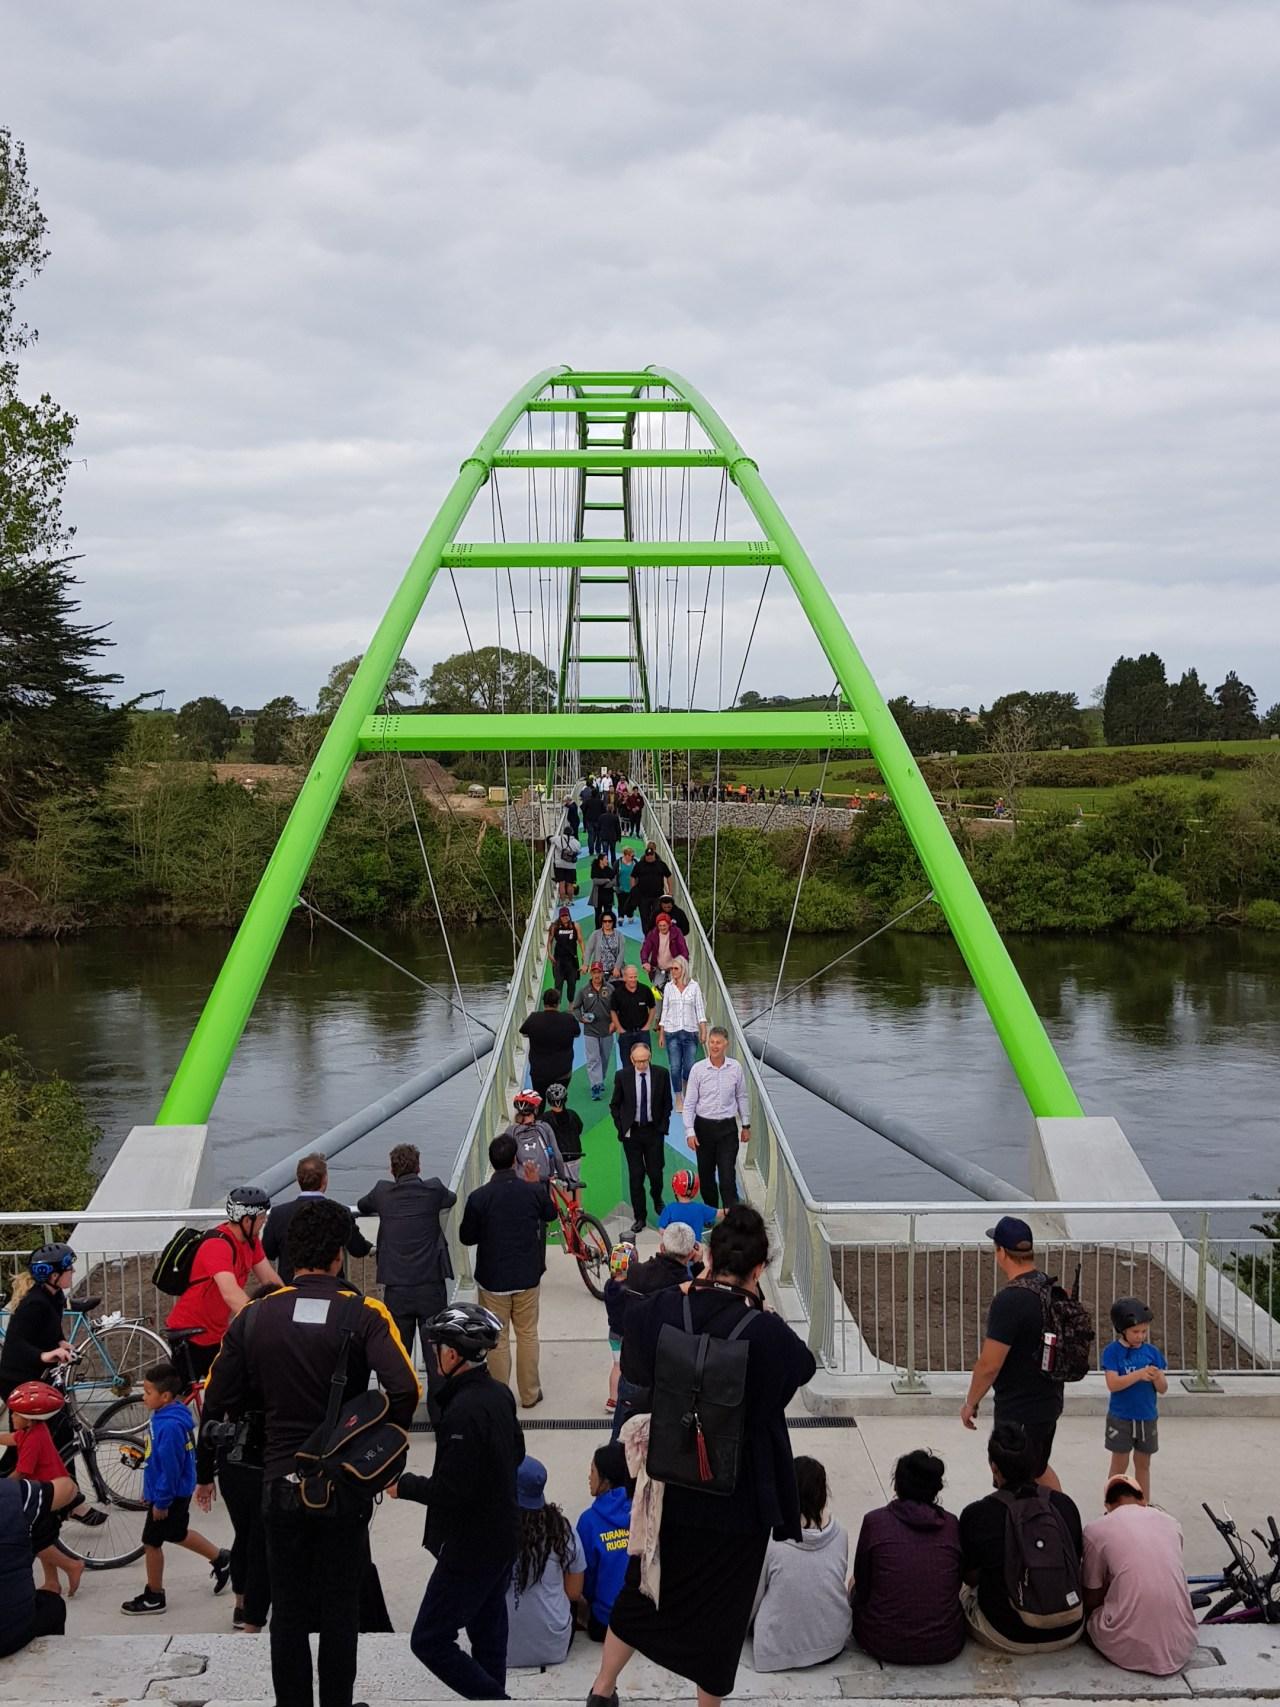 Perry Bridge opening. bridge, leisure, recreation, river, tourist attraction, tree, water, waterway, white